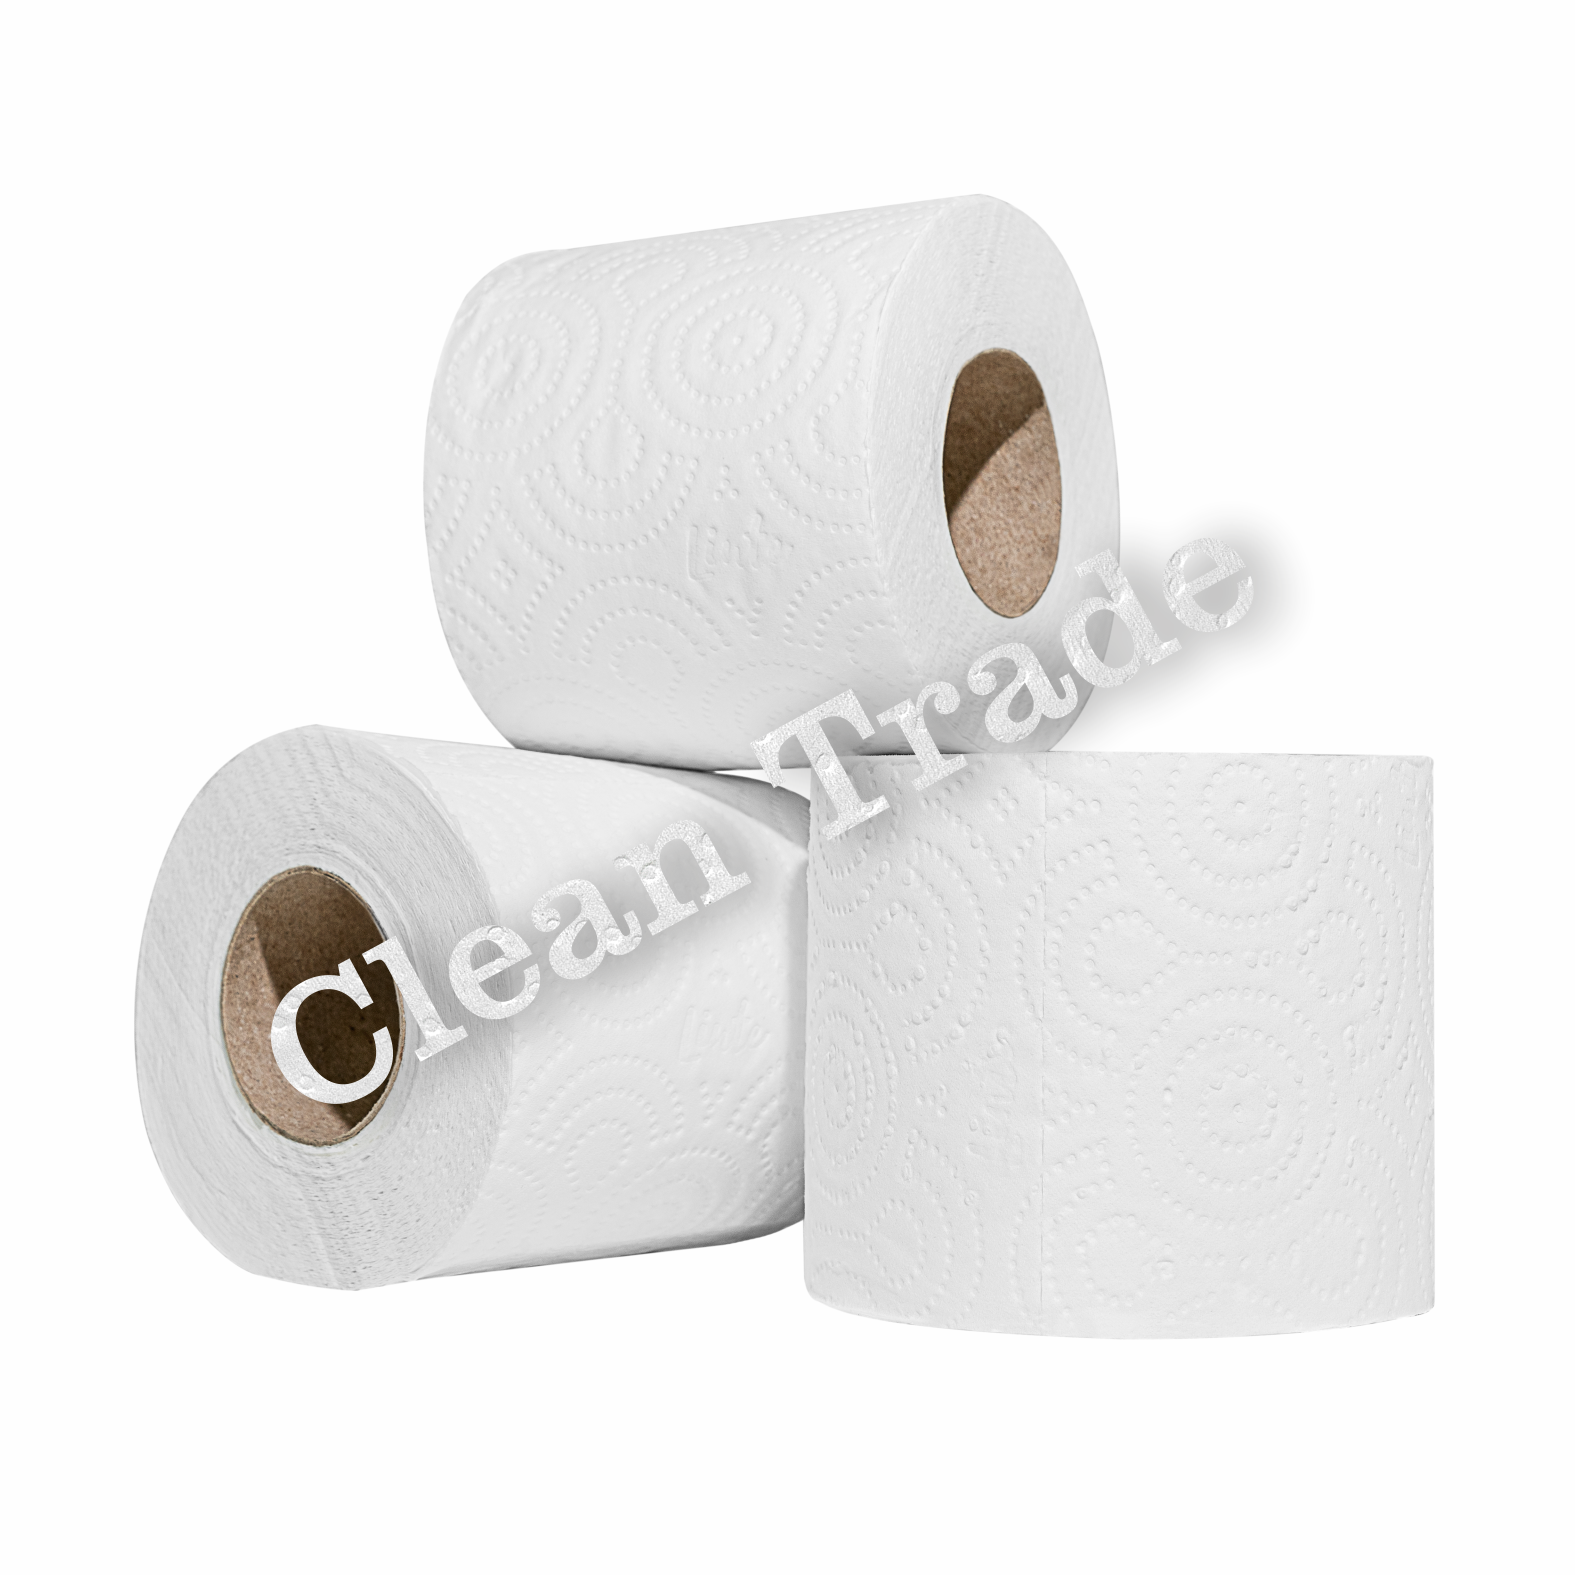 тоалетна хартия 80гр. 100% целулоза